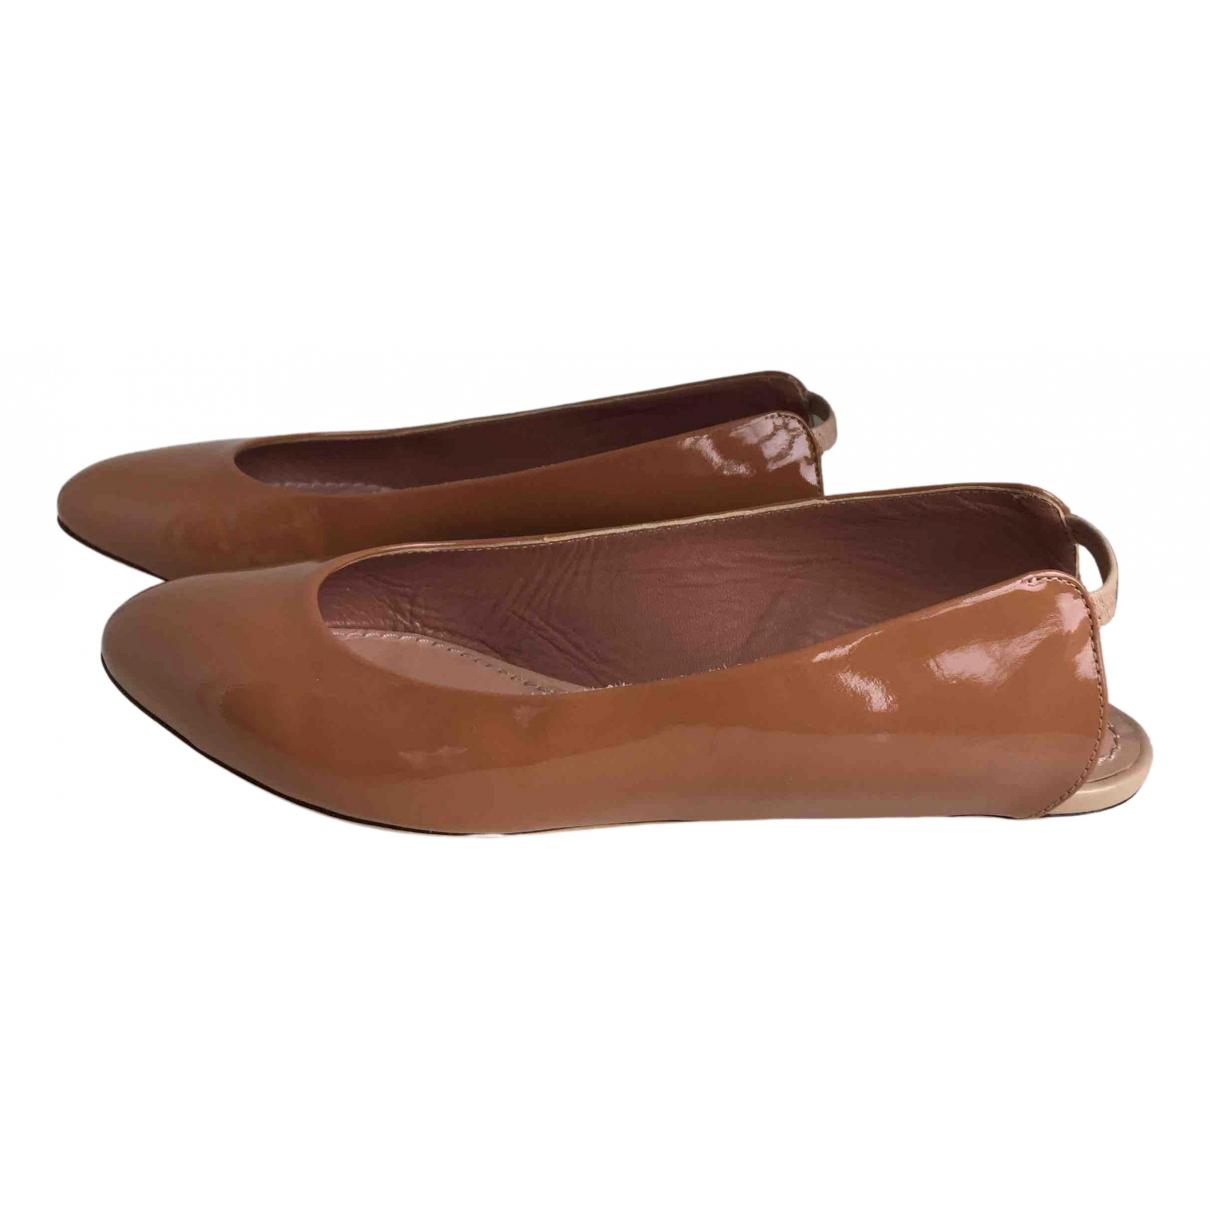 Marc Jacobs N Patent leather Ballet flats for Women 36.5 EU